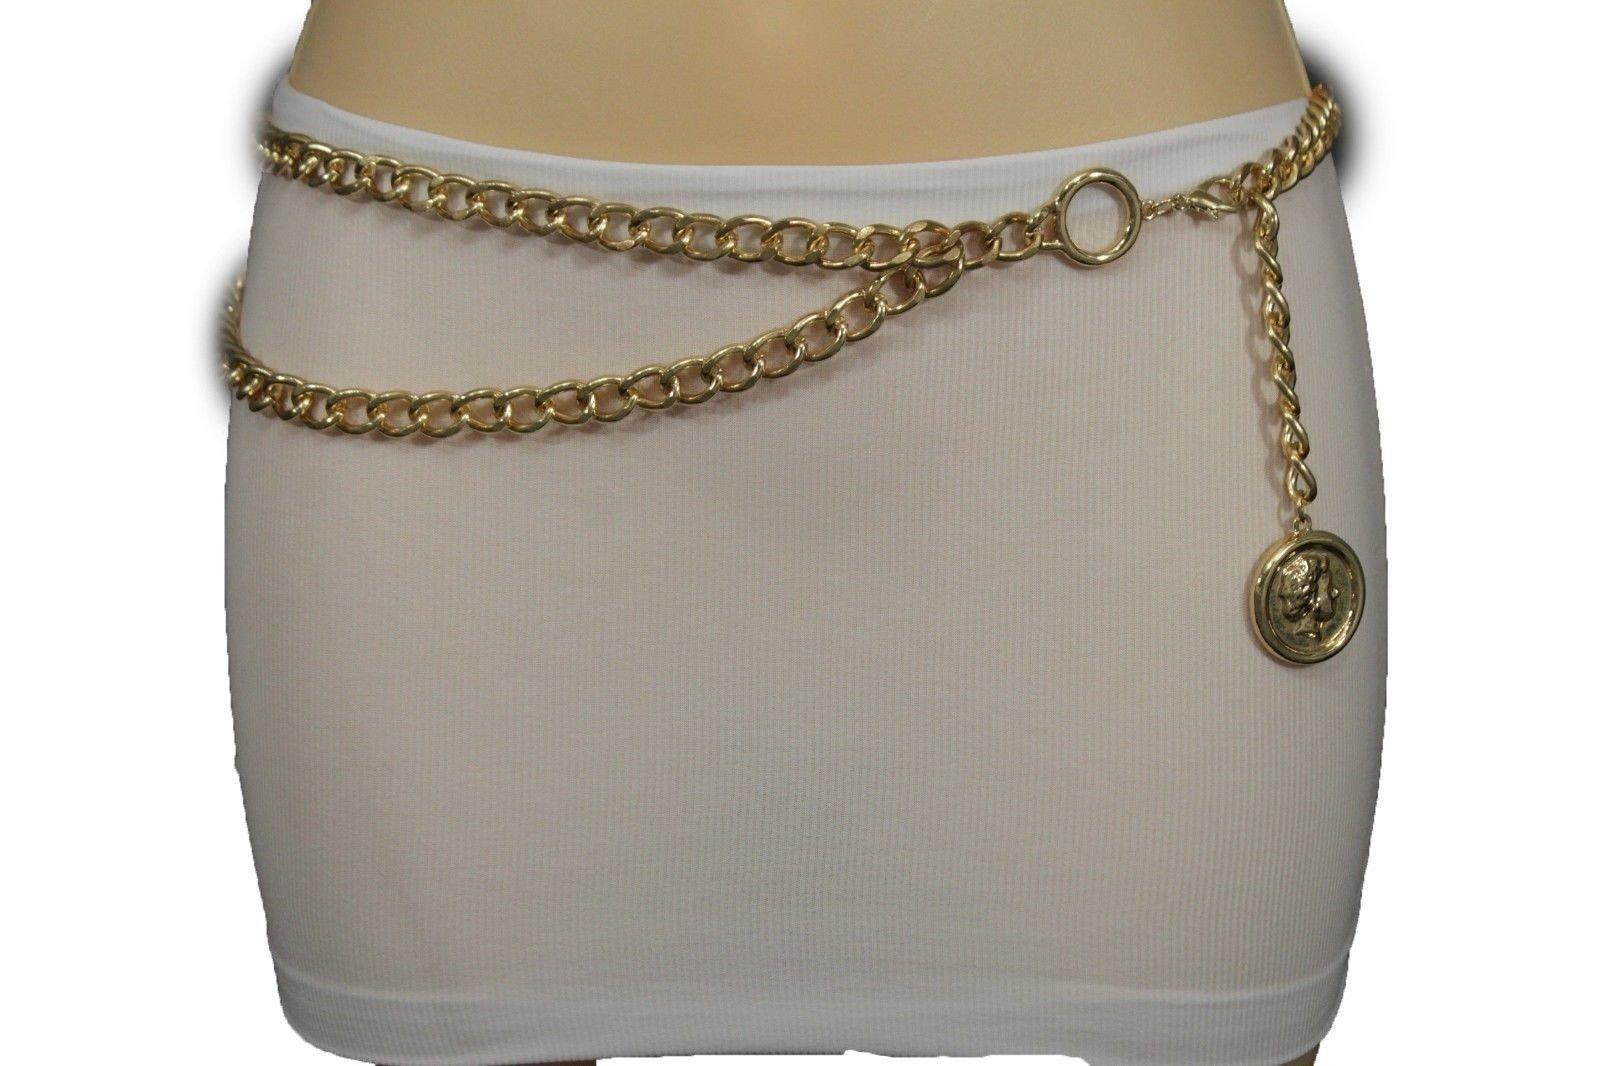 TFJ Women Fashion Belt Metal Chains Hip Waist Greek Coin Charm Gold XS S M